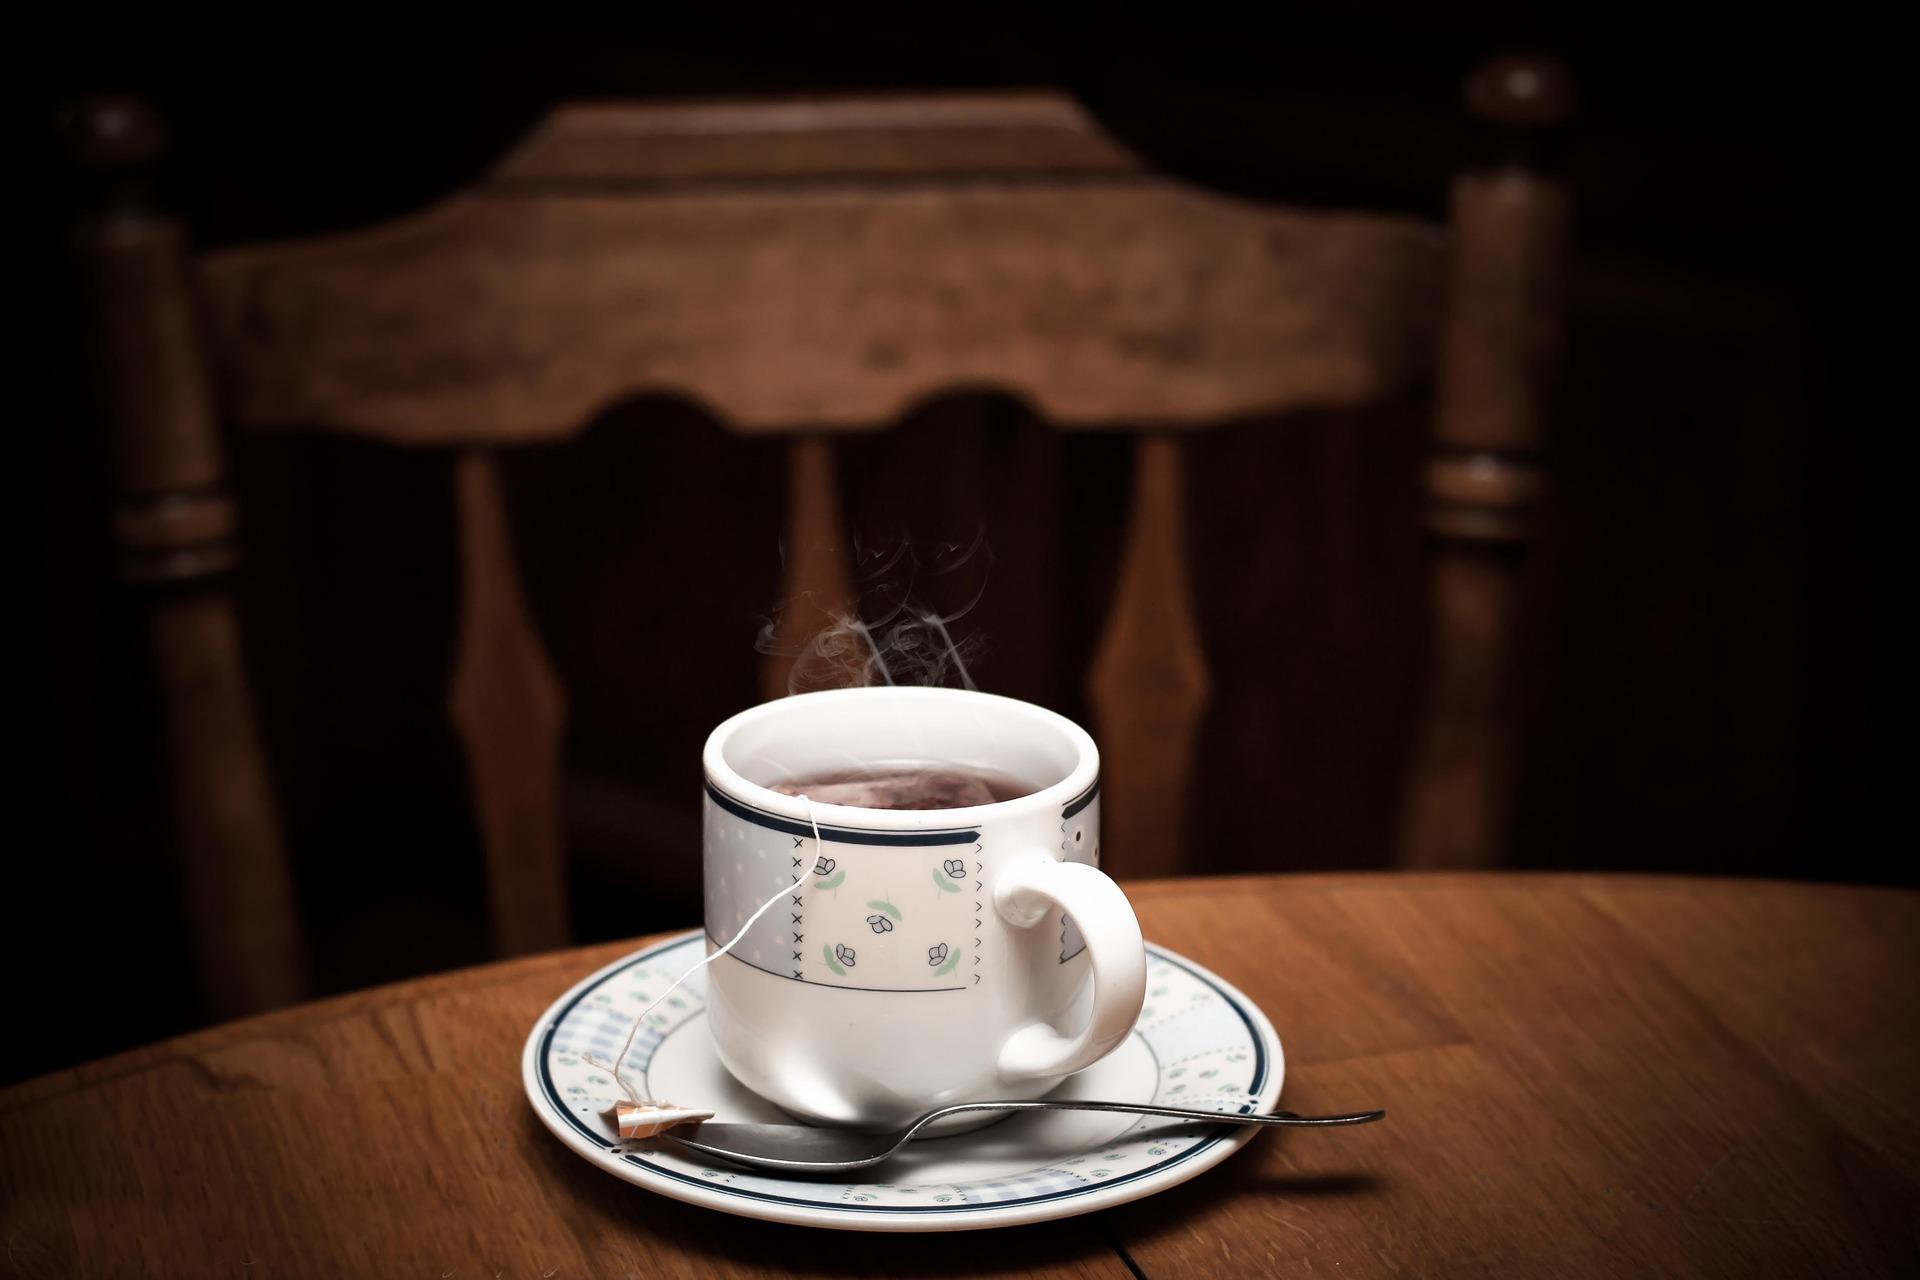 Weeklt y Economic News Roundup and natural momopoly peak demand for tea